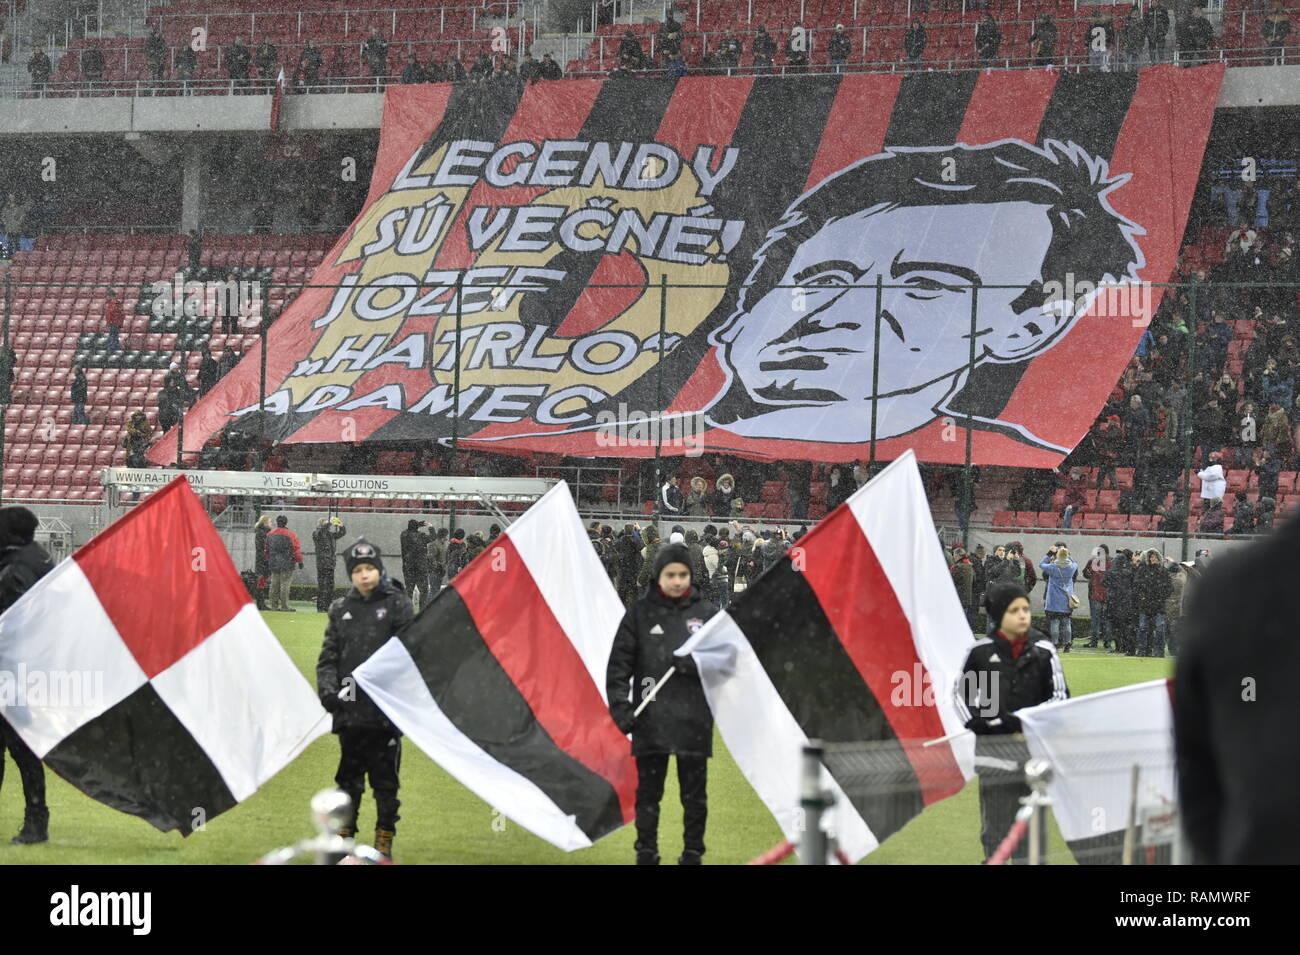 Last farewell ceremony with legendary Slovak football forward Jozef